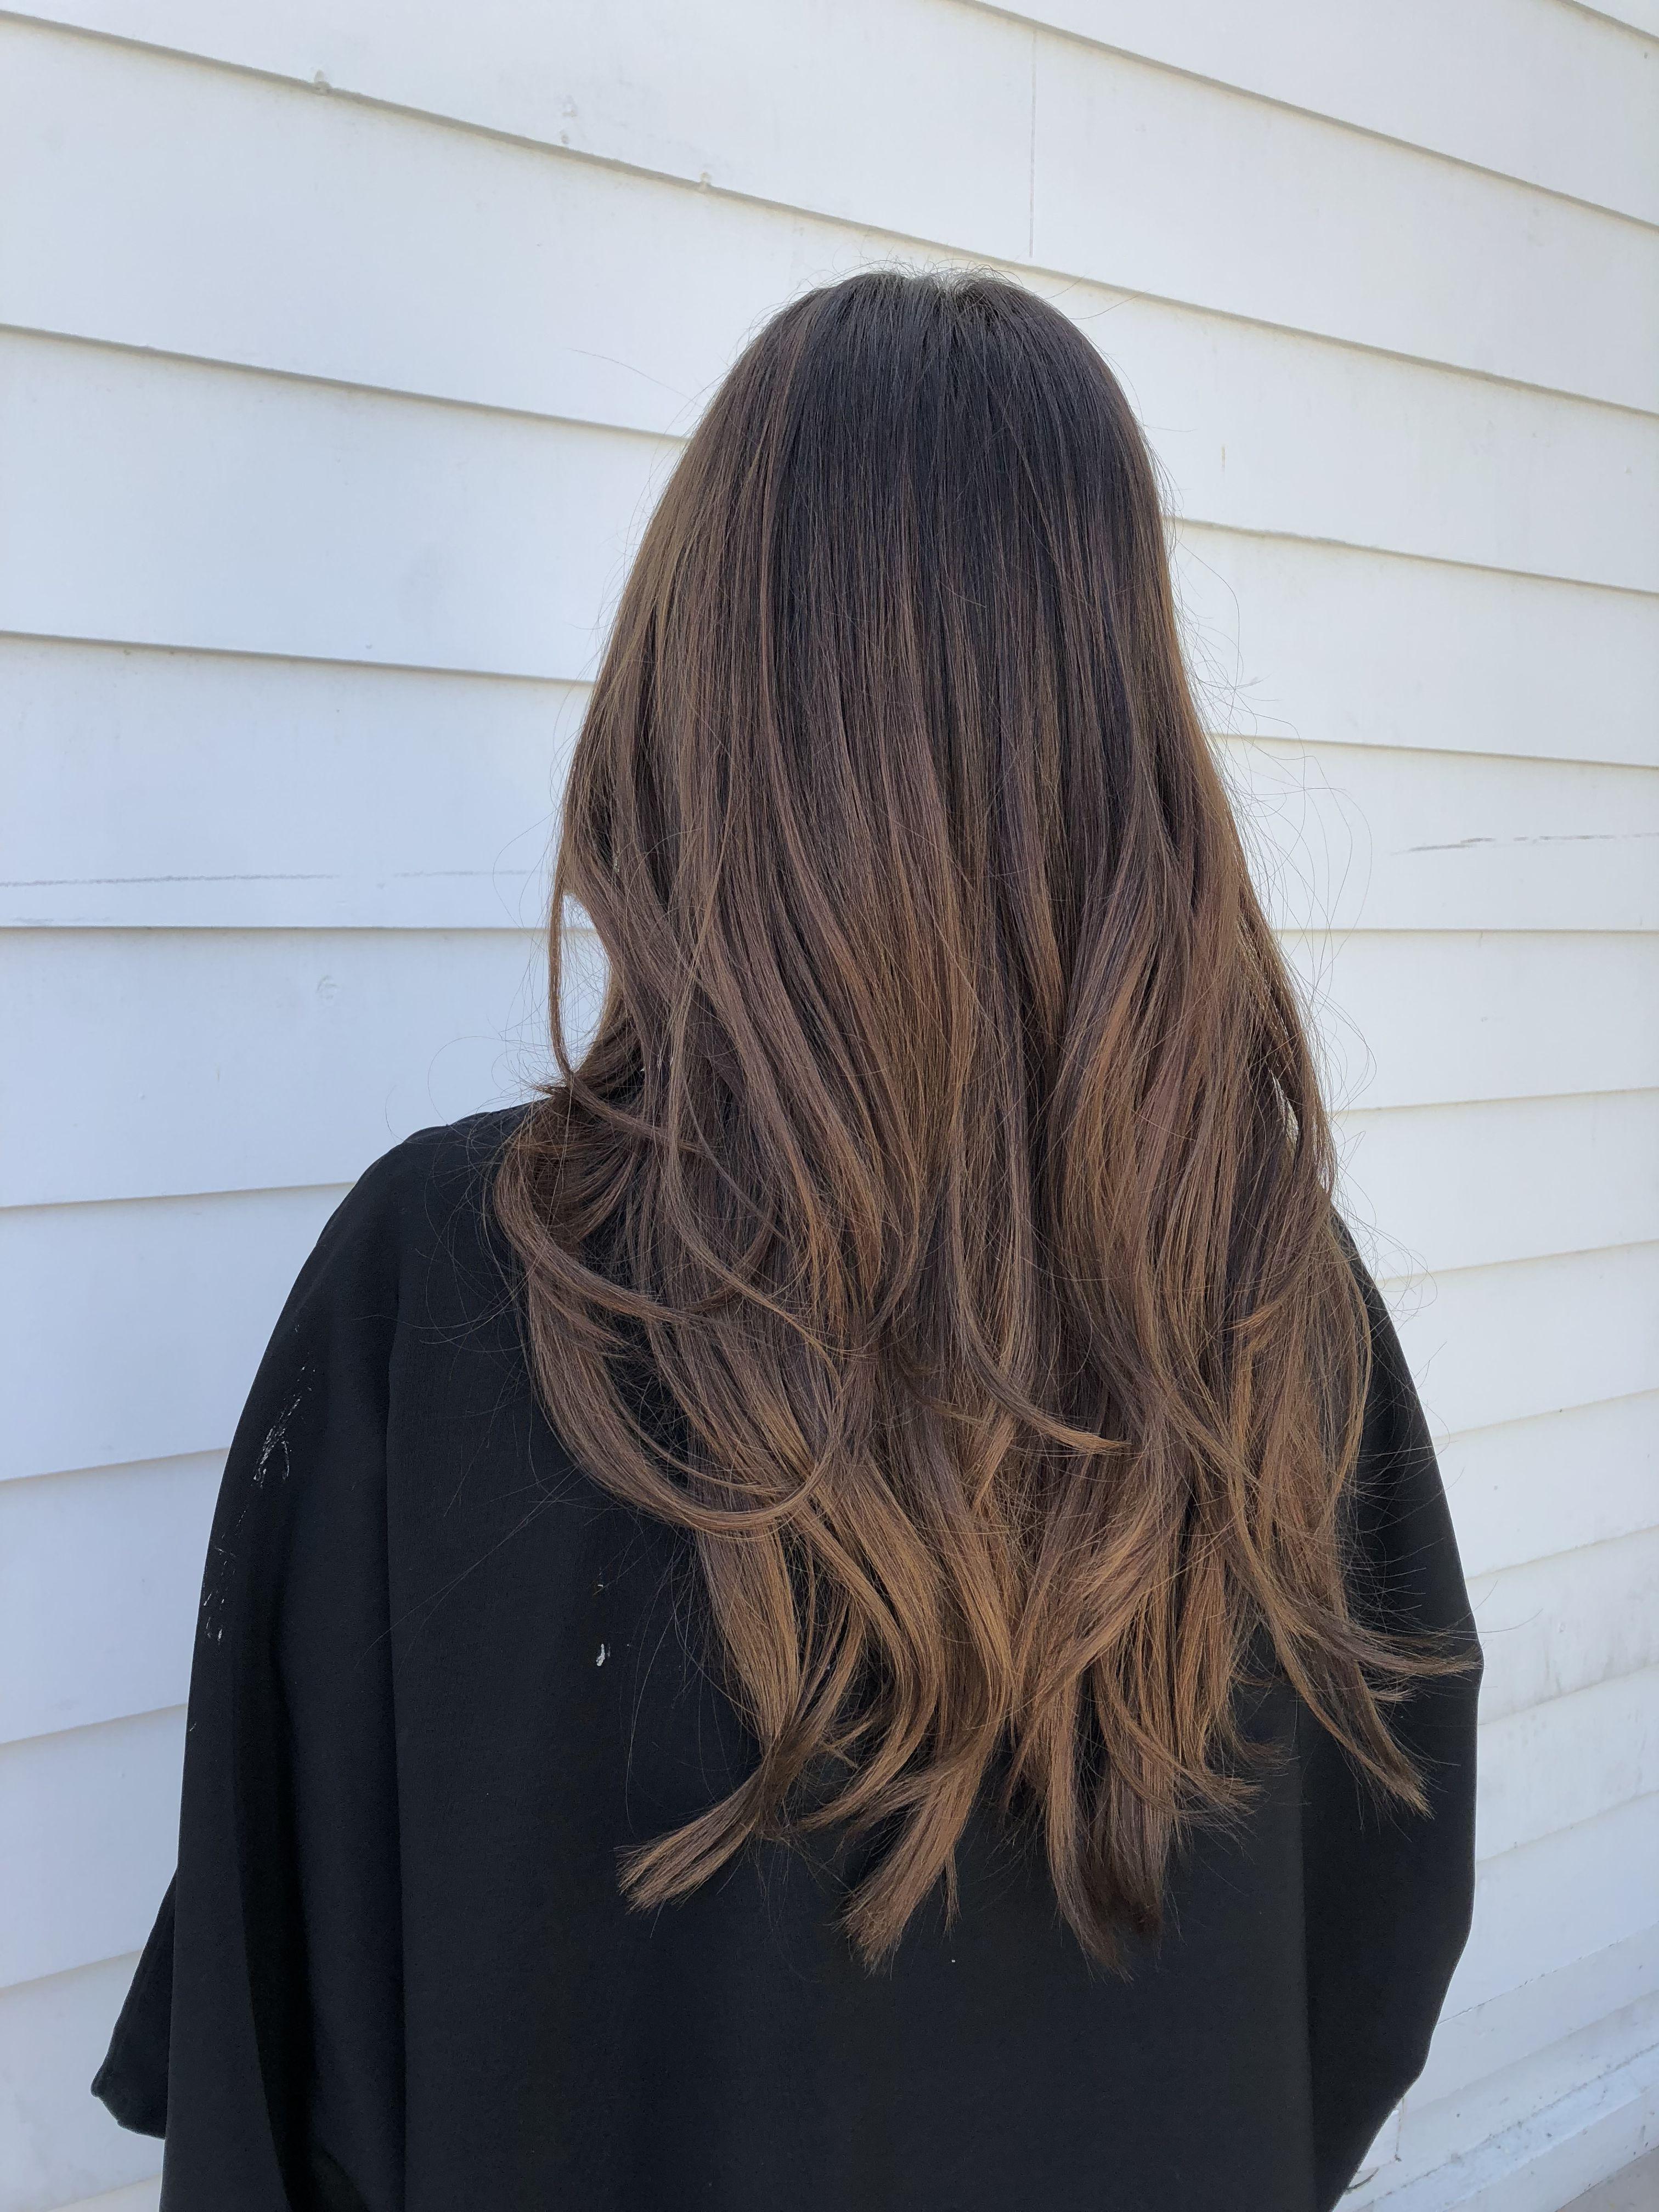 Balayage #hair #hairbyorit #haircolor #pravana #color  #sunkissedhair #wella #wellafreelights #behindthechair #balayage #ombre #highlights #livedinhair #beauty #fashion #vsco #hairstylist #cosmetologist #usmoothhair #losangeles #usmooth #hairstyle #style #beachwaves #losangelesstylist #citiesbesthairartists #blonde #blondie #blondebombshell #blondeshavemorefun #caramelbalayage